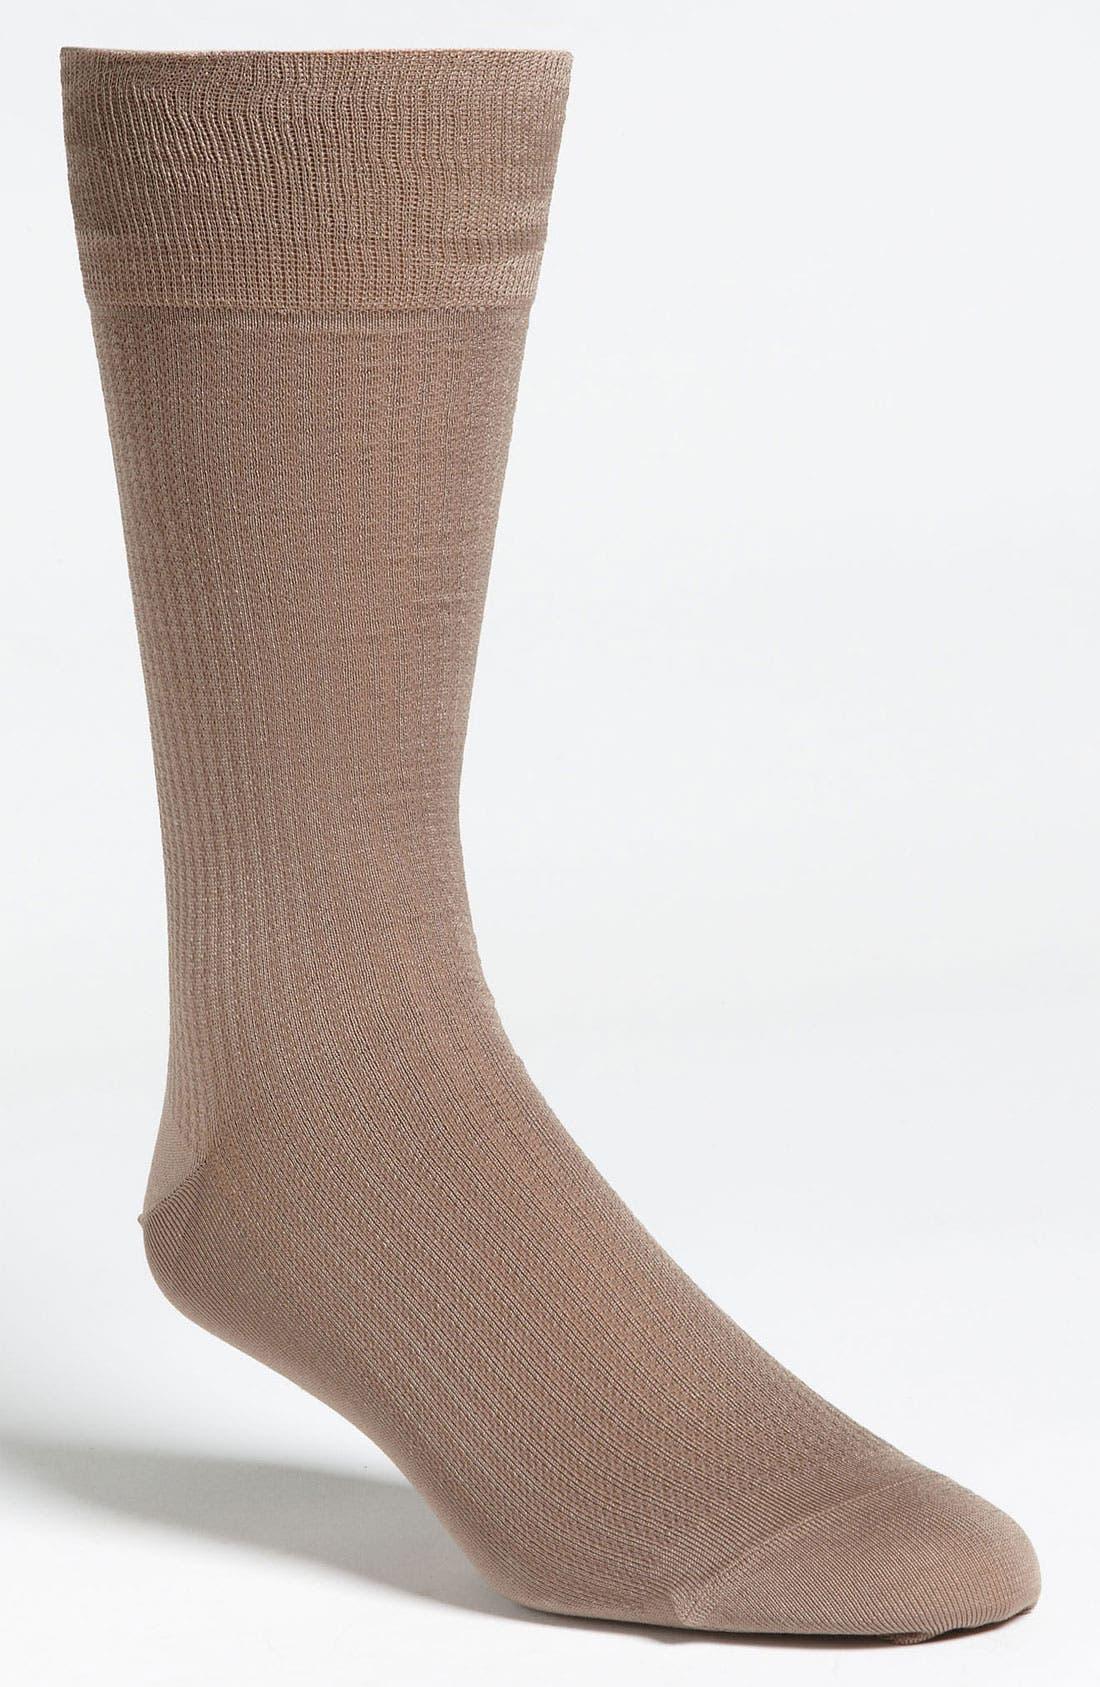 Main Image - John W. Nordstrom® Houndstooth Socks